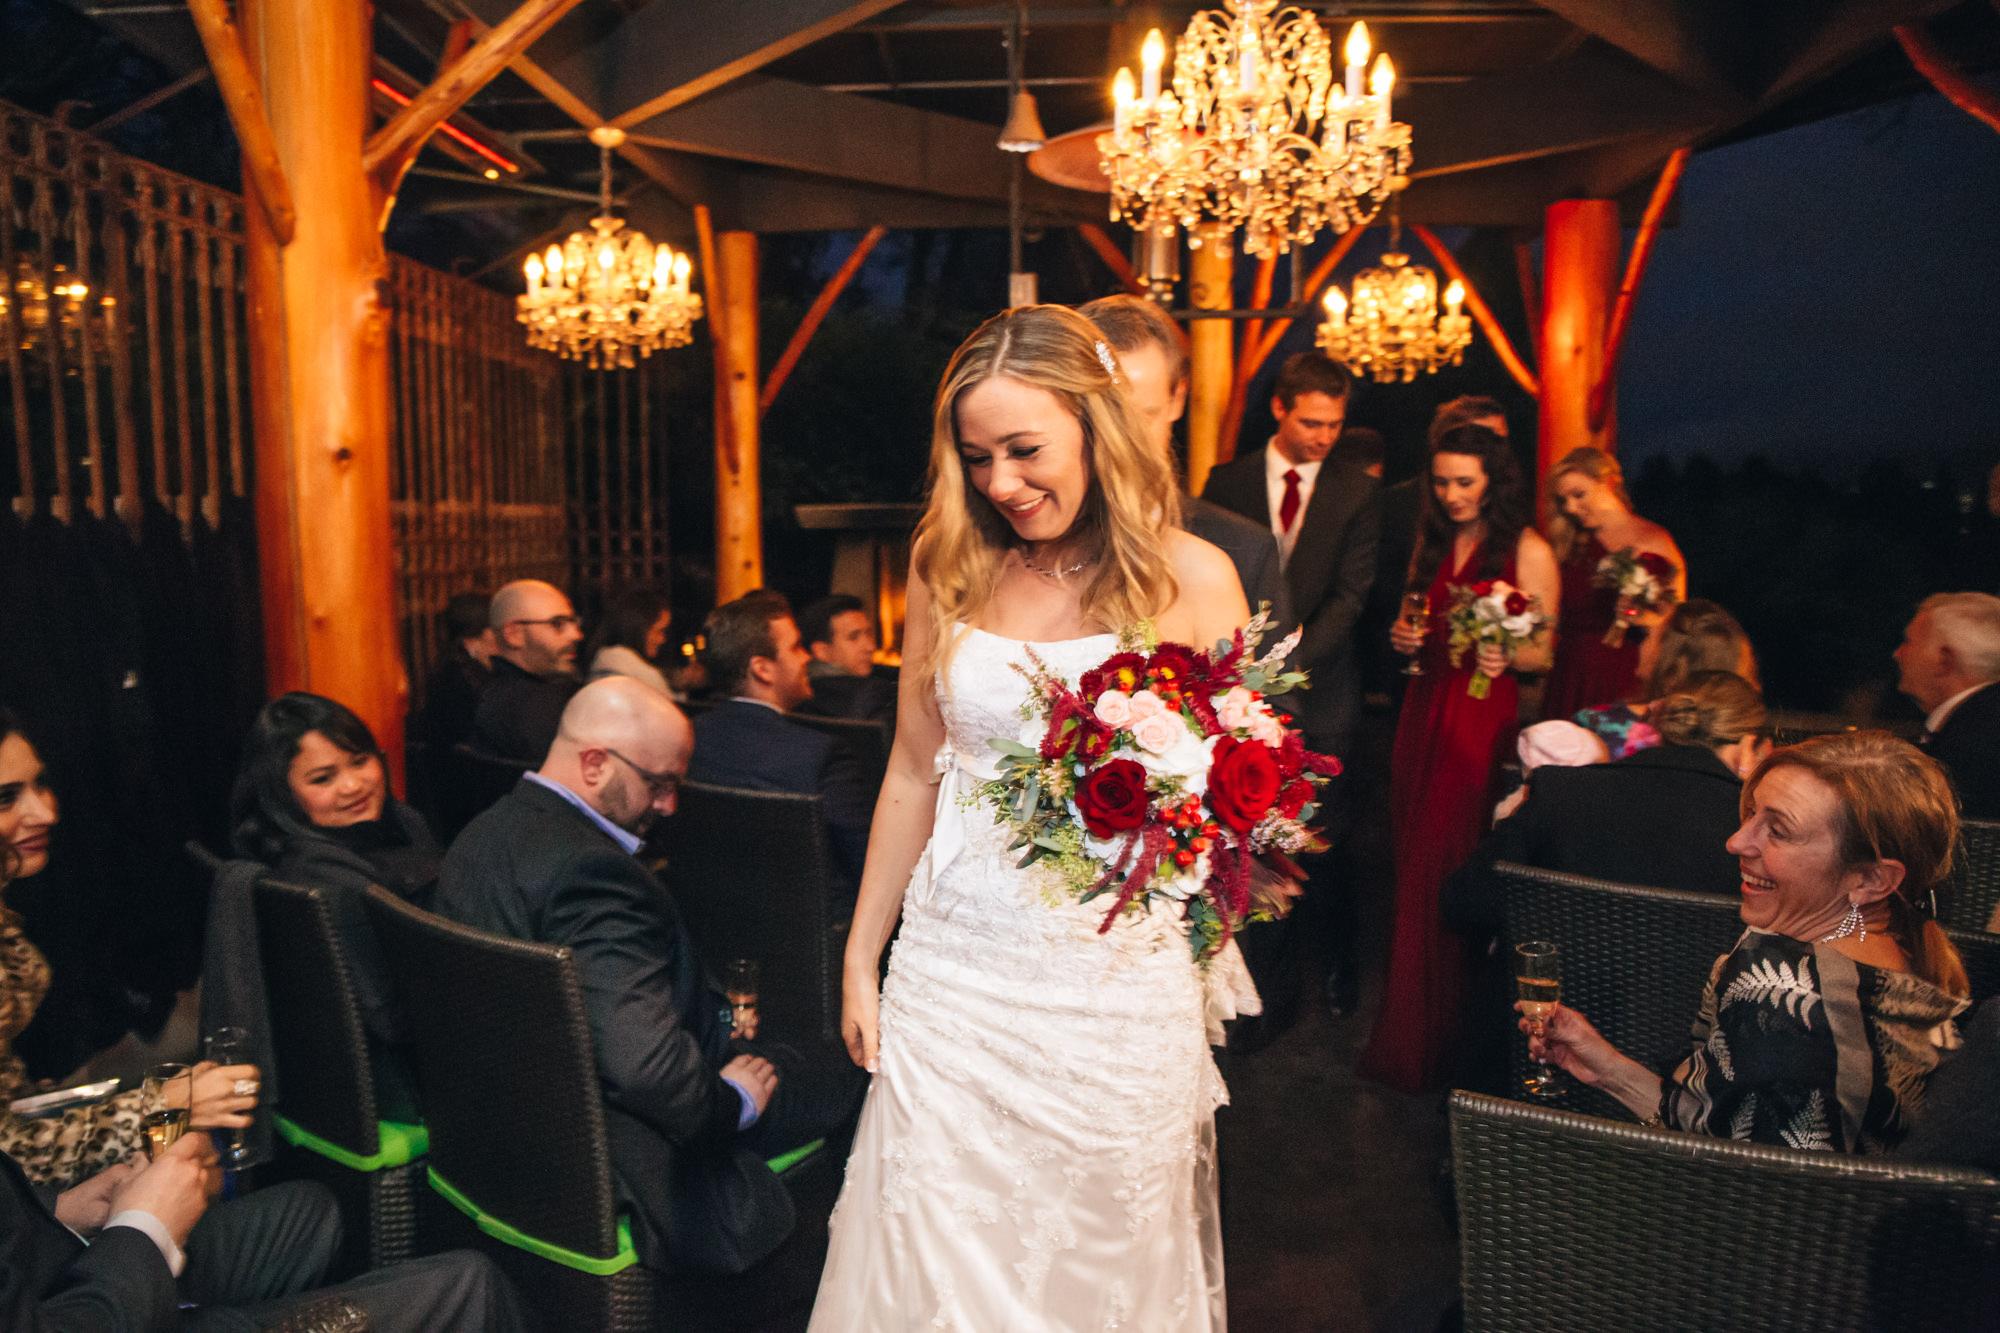 44-seasons-in-the-park-wedding-ceremony.jpg